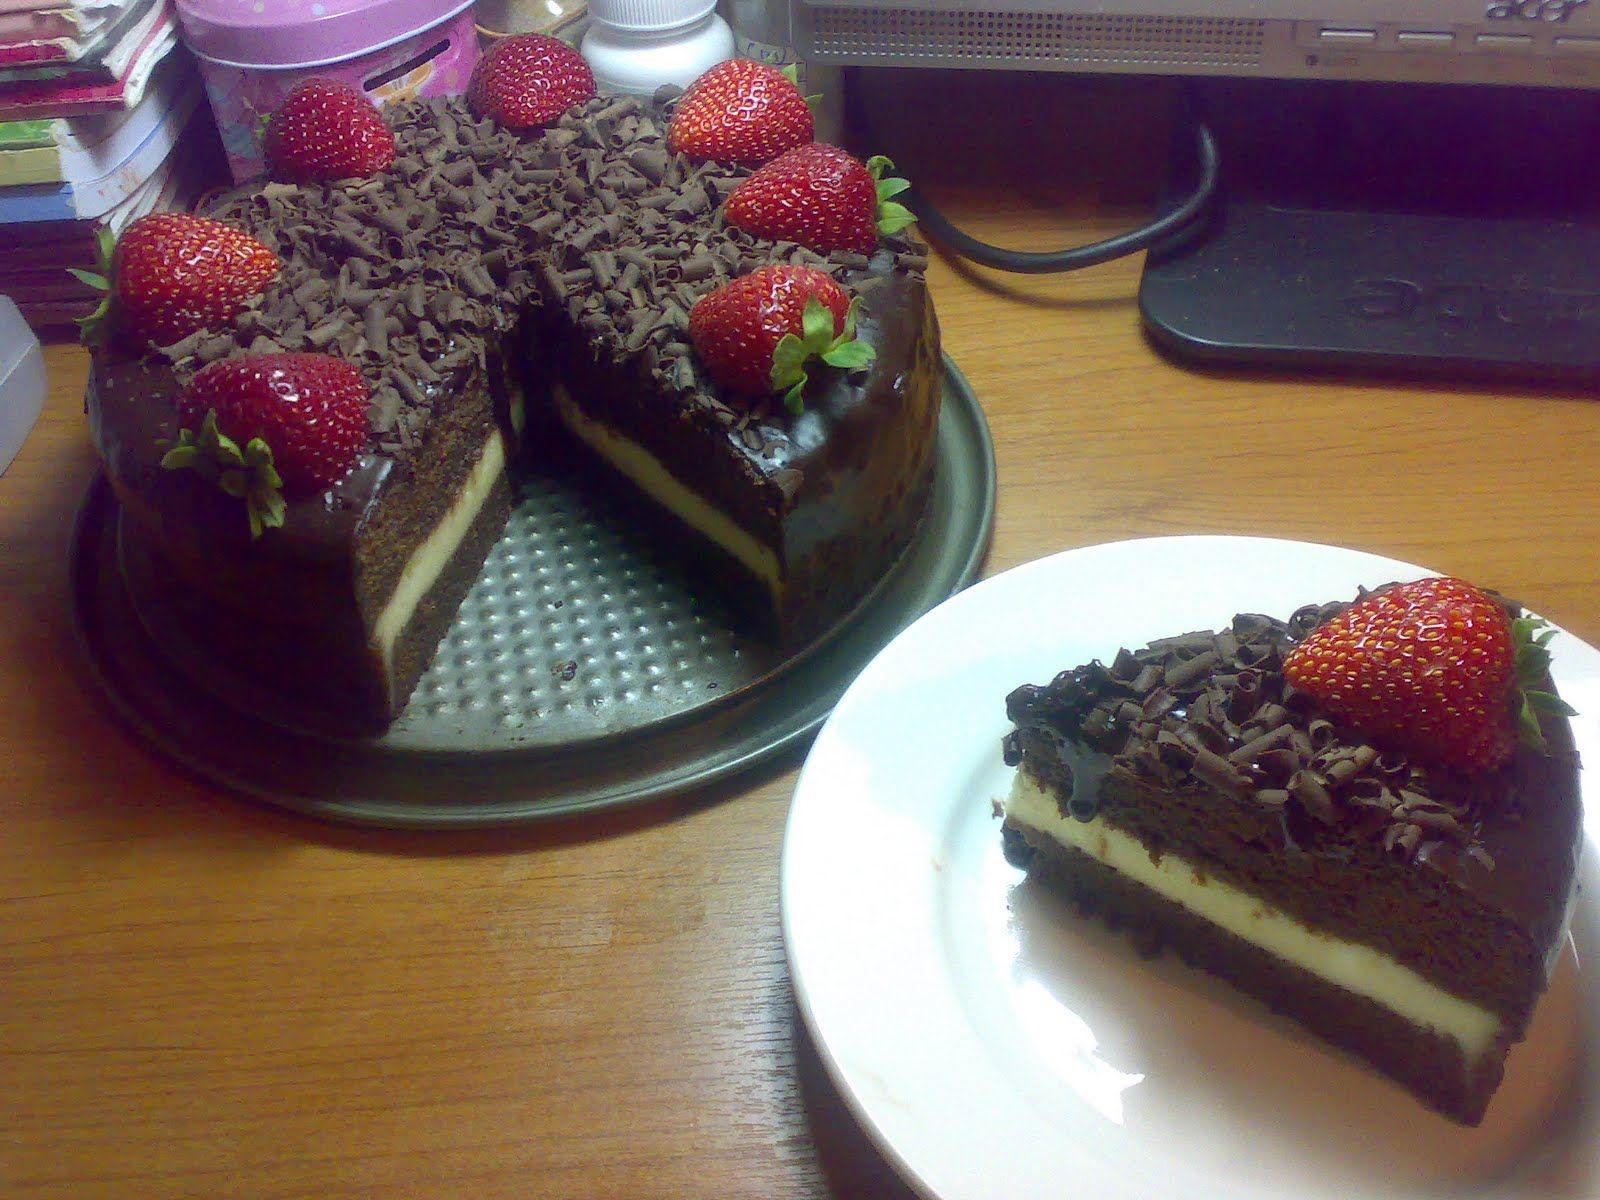 SWEET VNiLL Resipi Kek Coklat Lapis Cheese Kukus Choc Moist cake